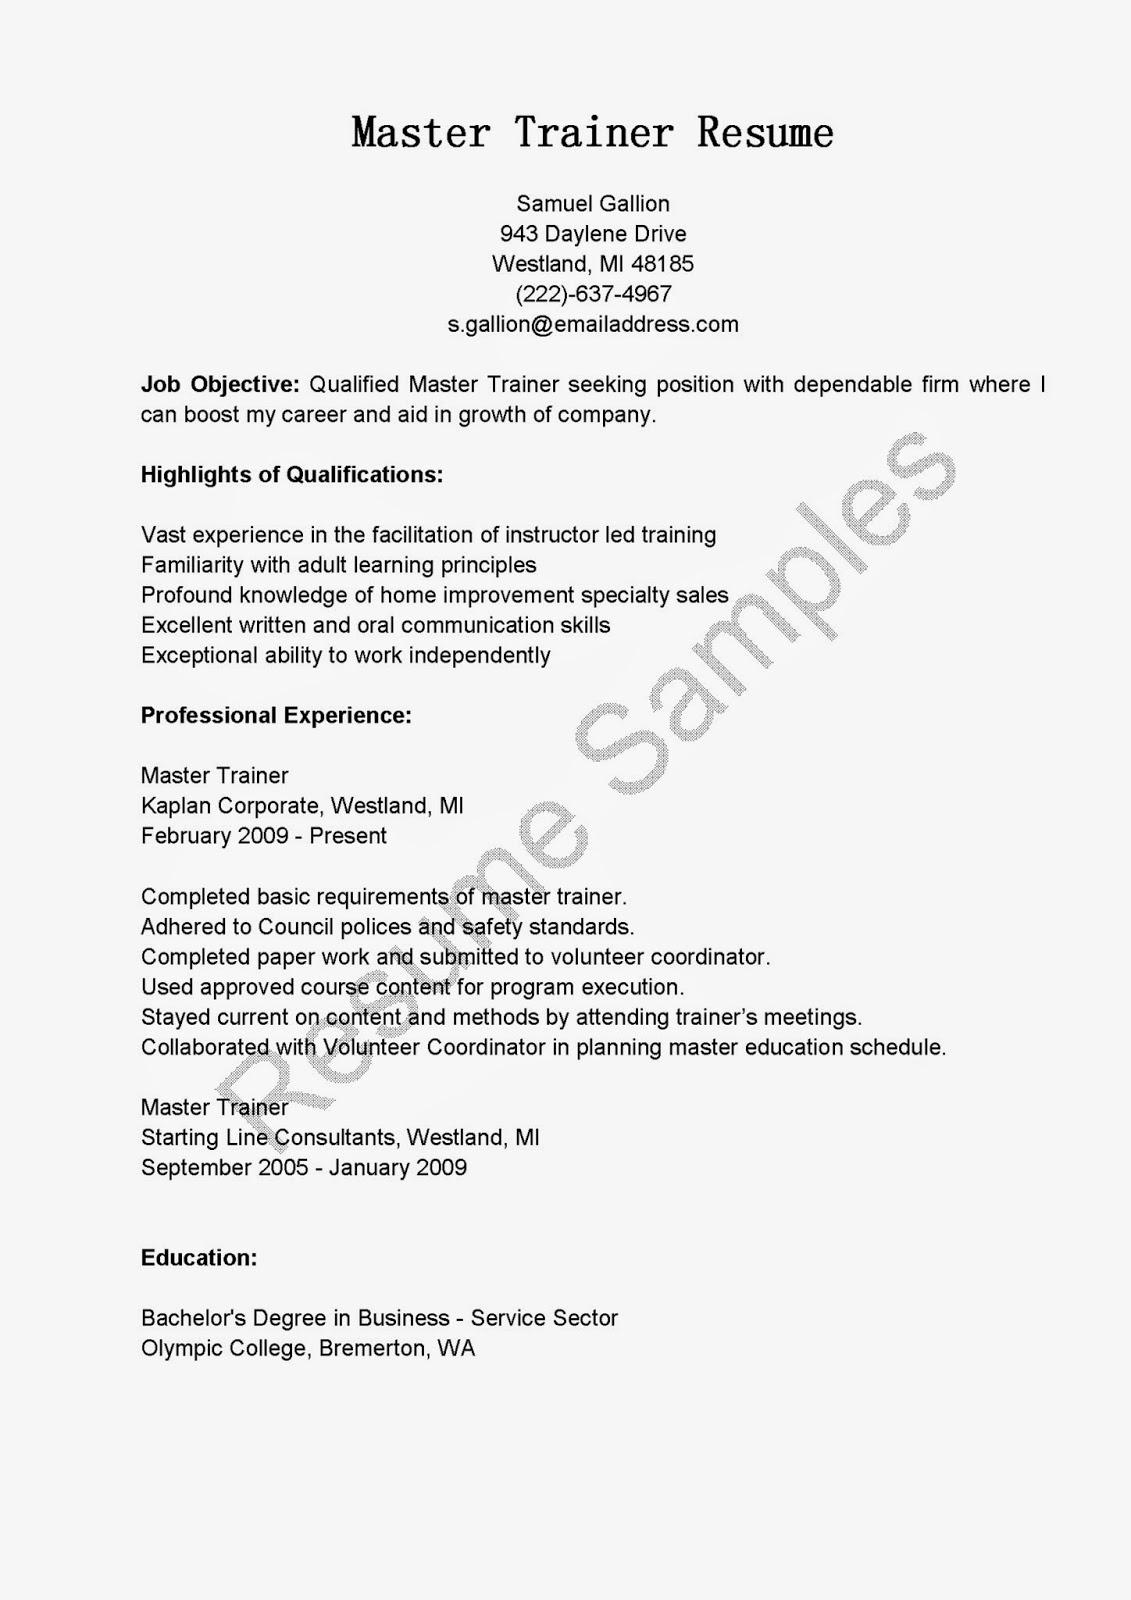 resume samples  master trainer resume sample